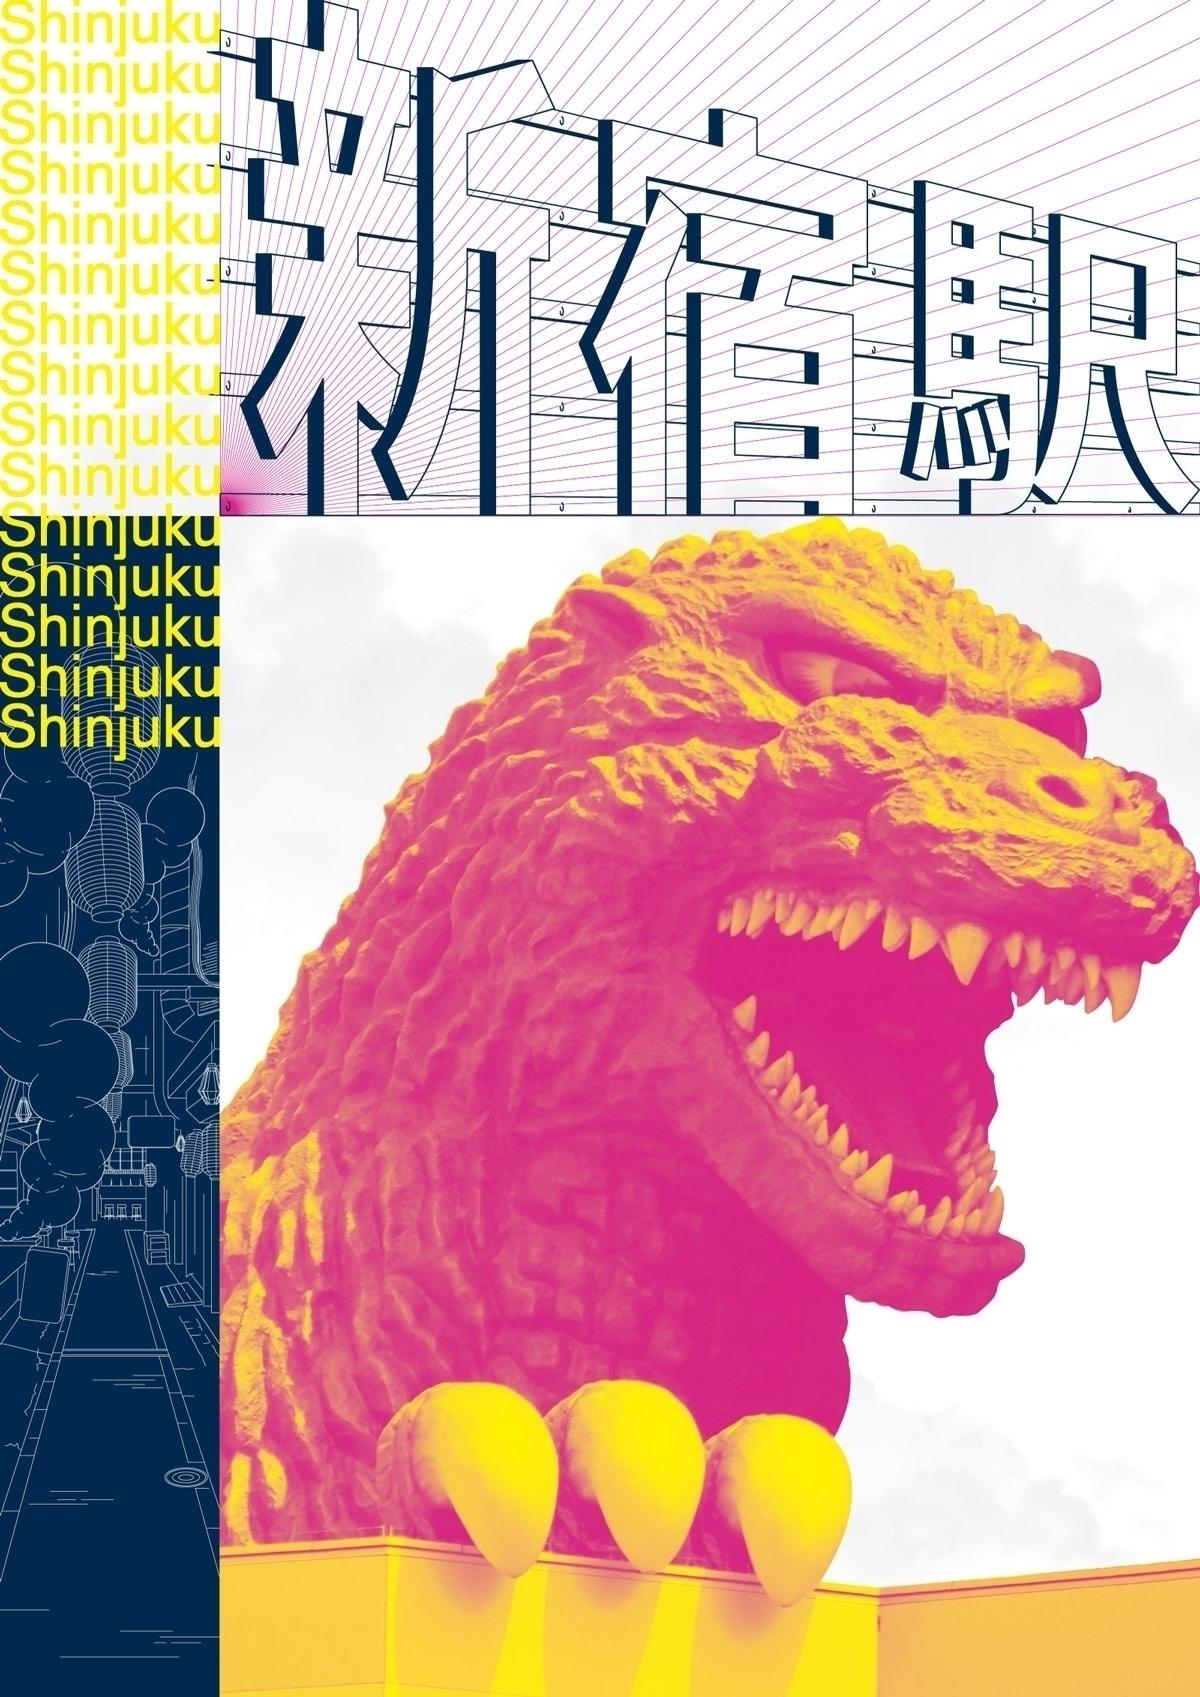 Poster YY16 Shinjuku - 新宿 Yaman - wulffgraphics   ello